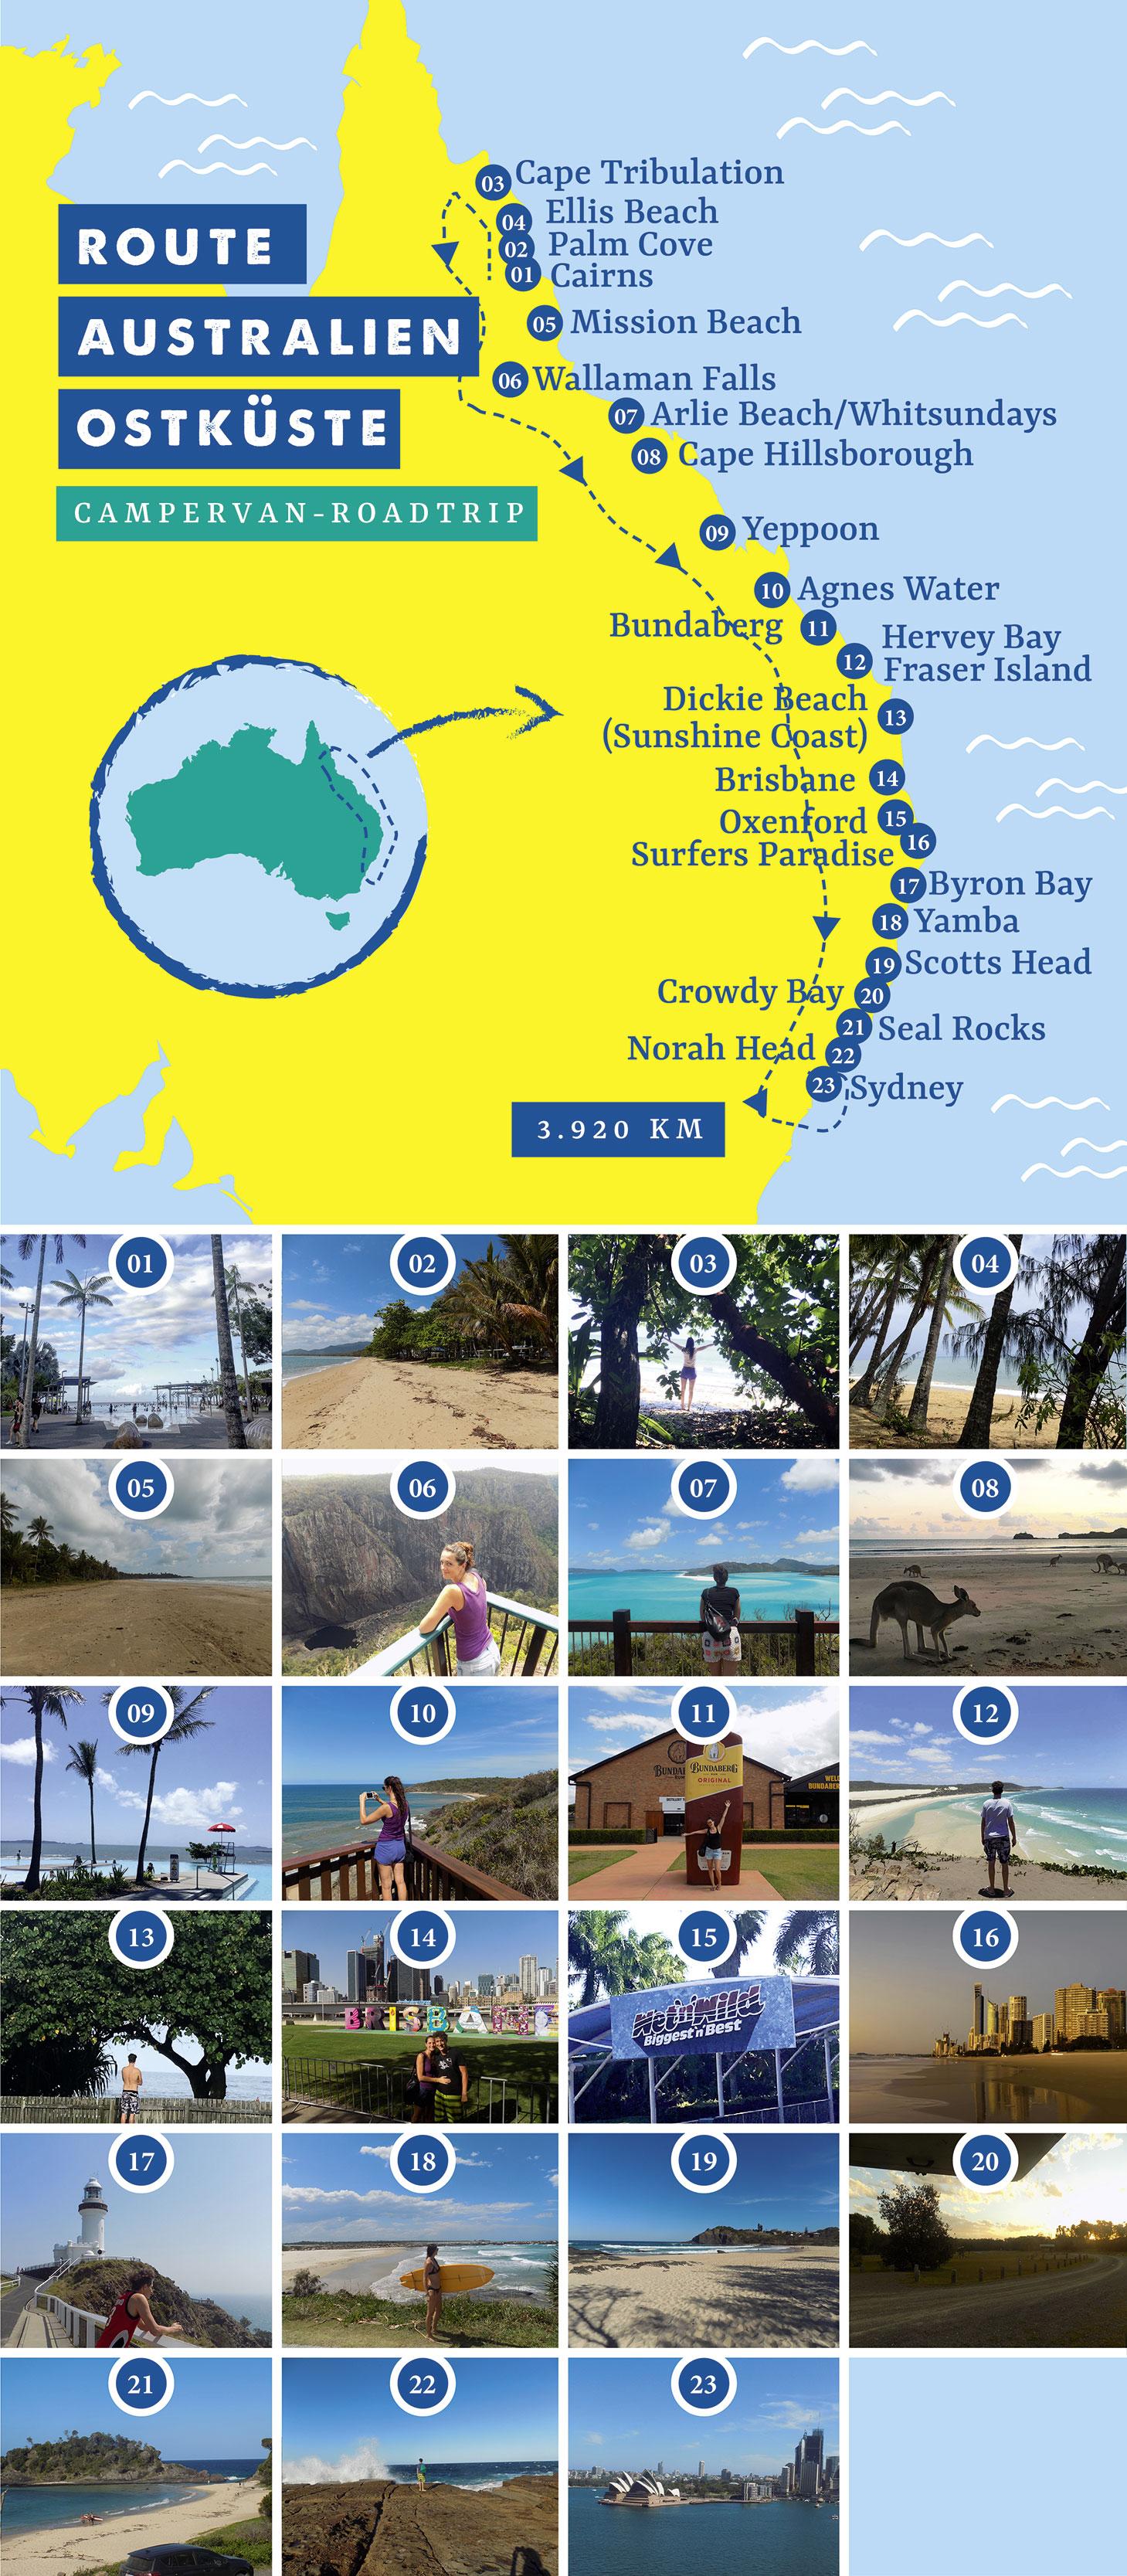 reiseroute australien ostkueste